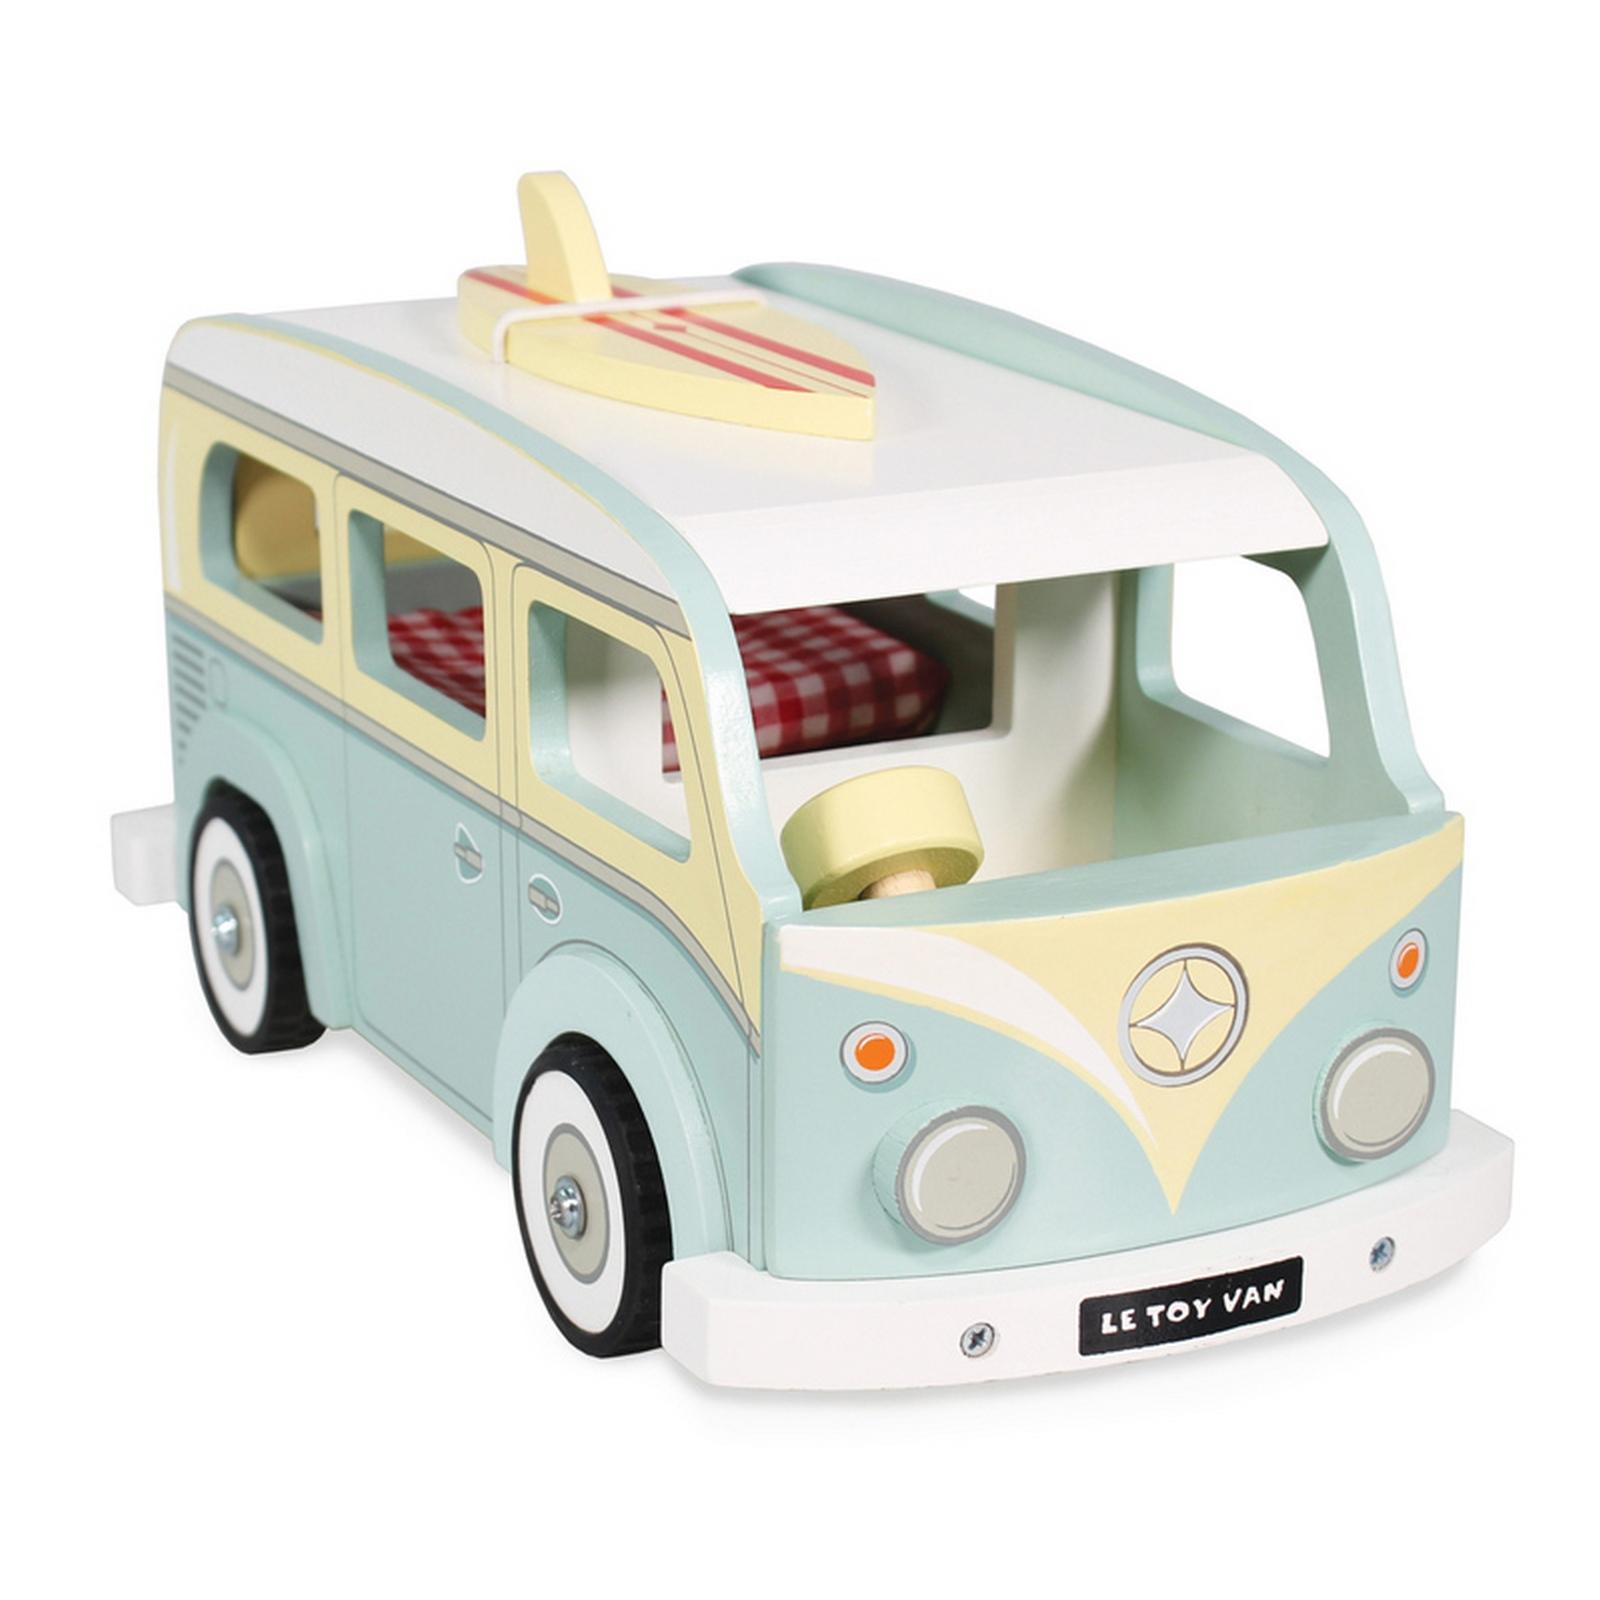 Le Toy Van Holiday Campervan - Jadrem Toys